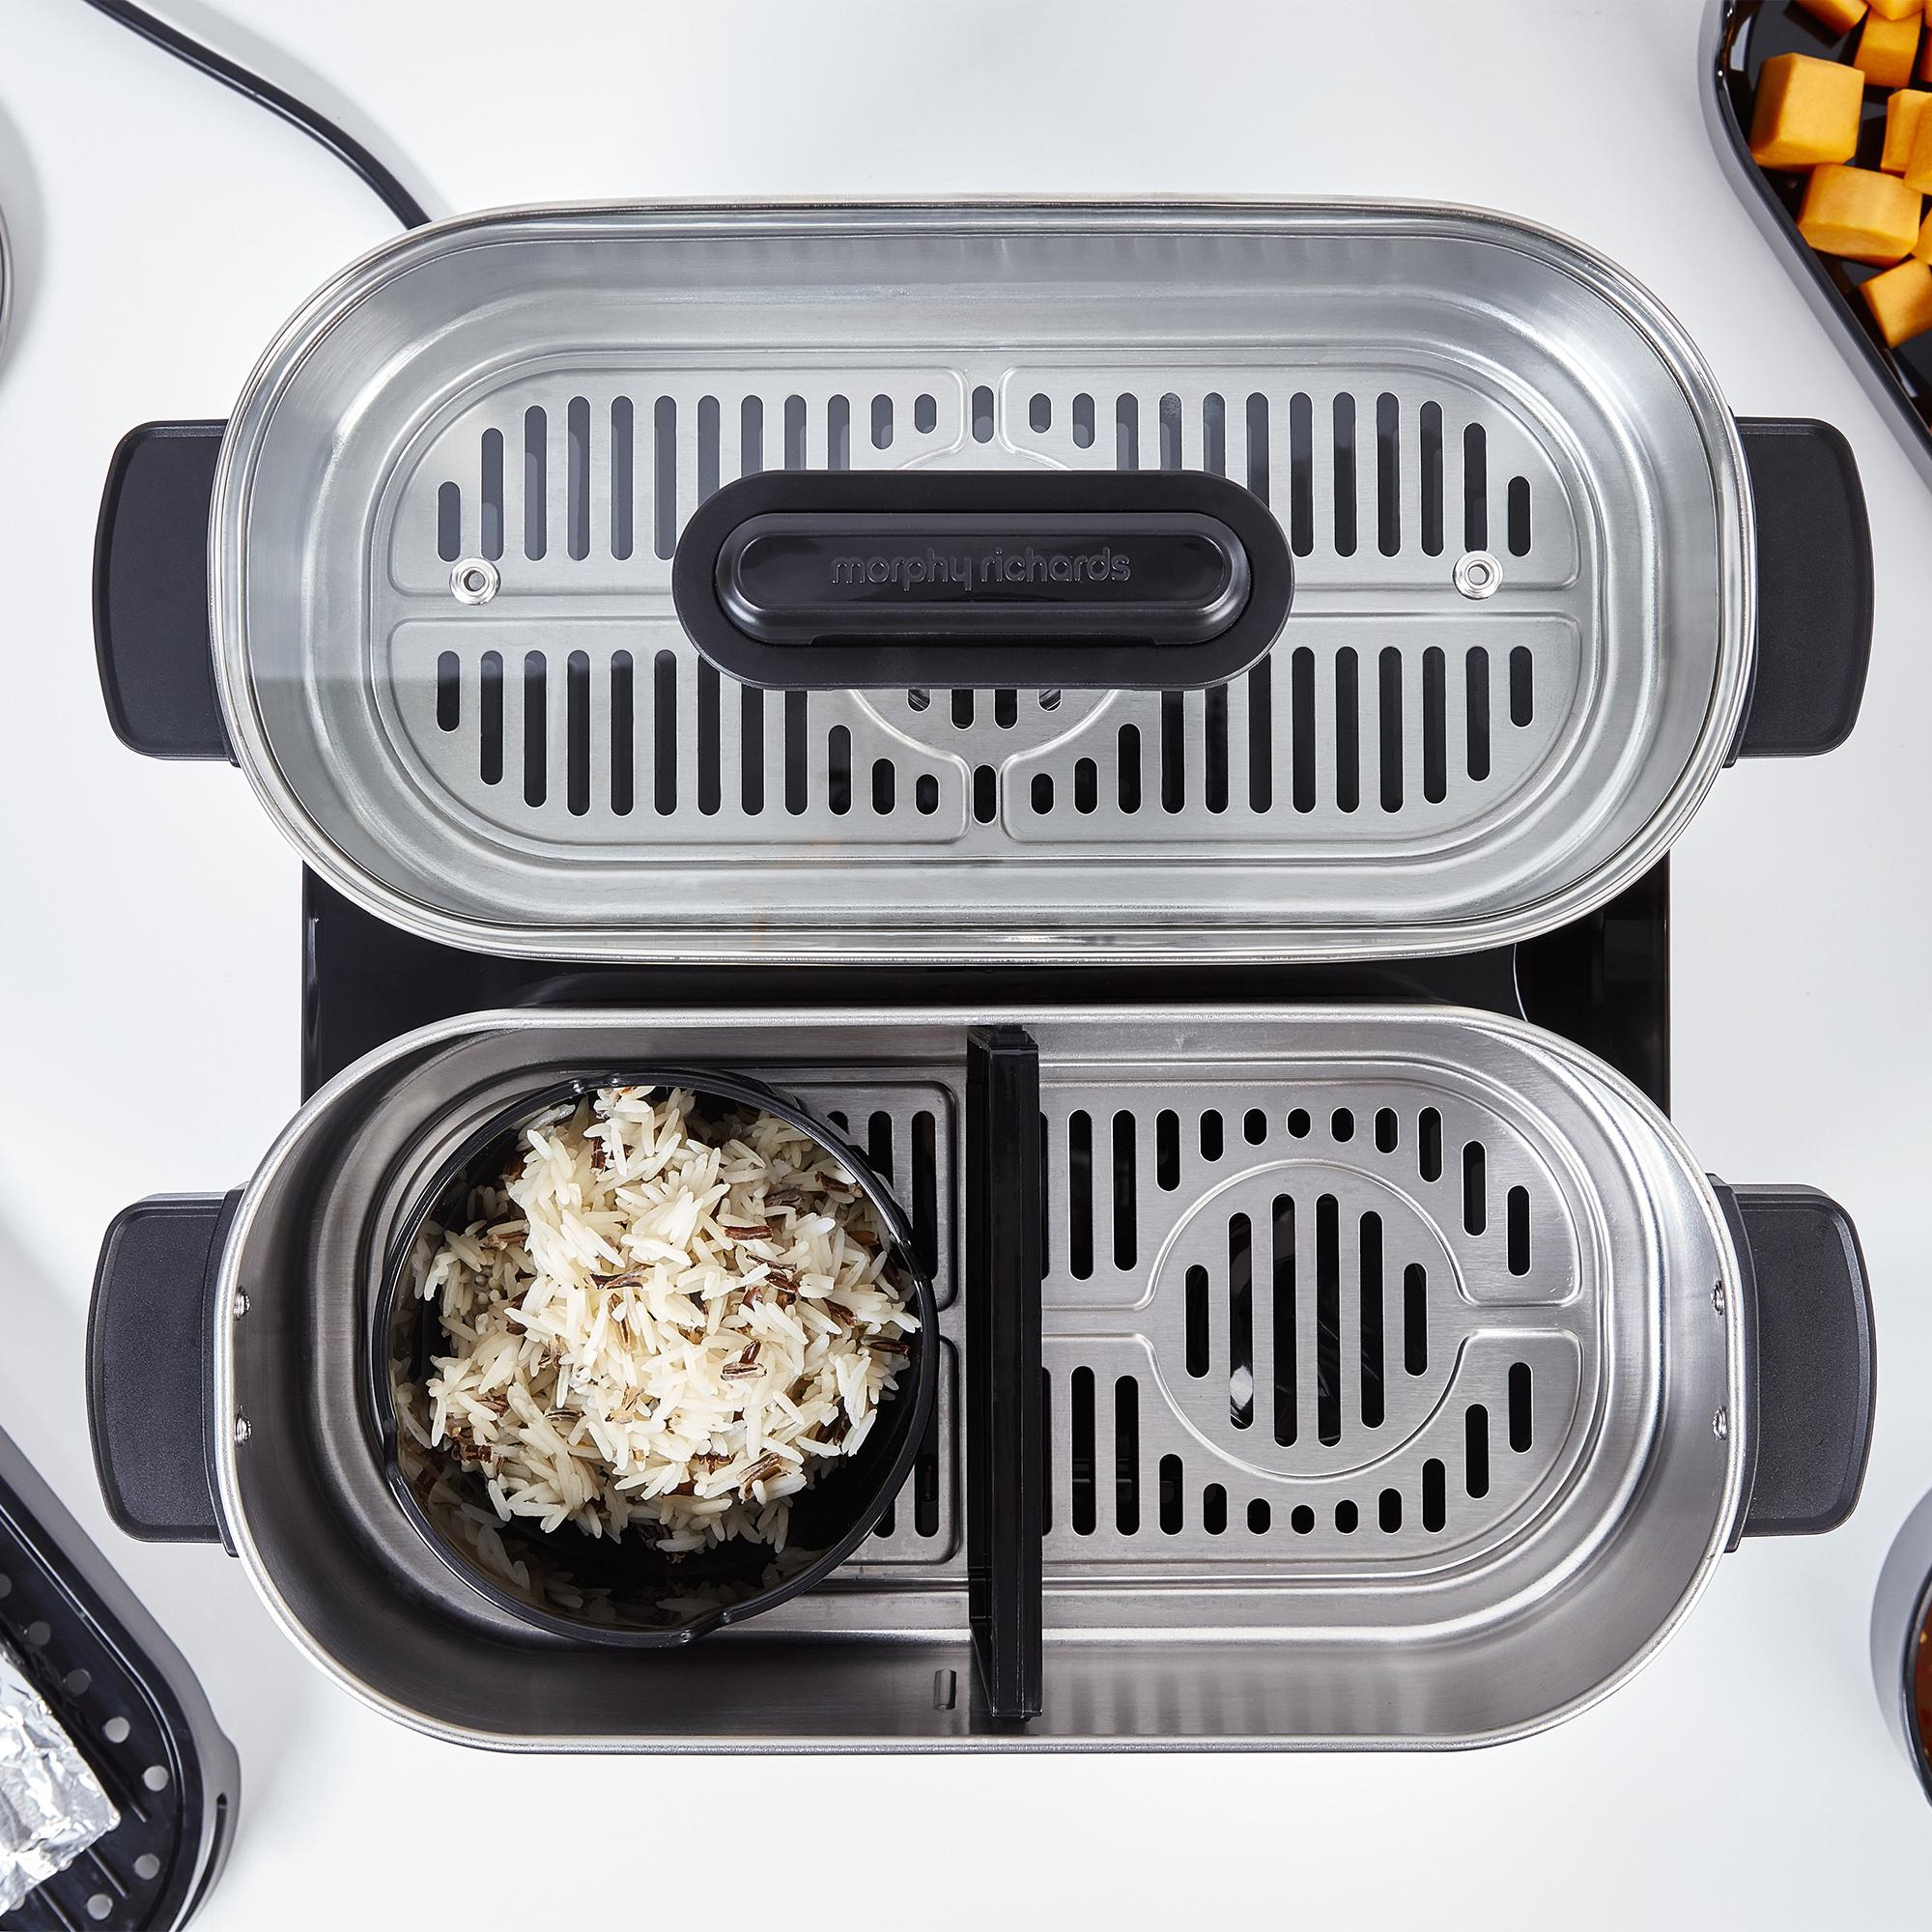 Morphy Richards Intellisteam Electric Food Steamer